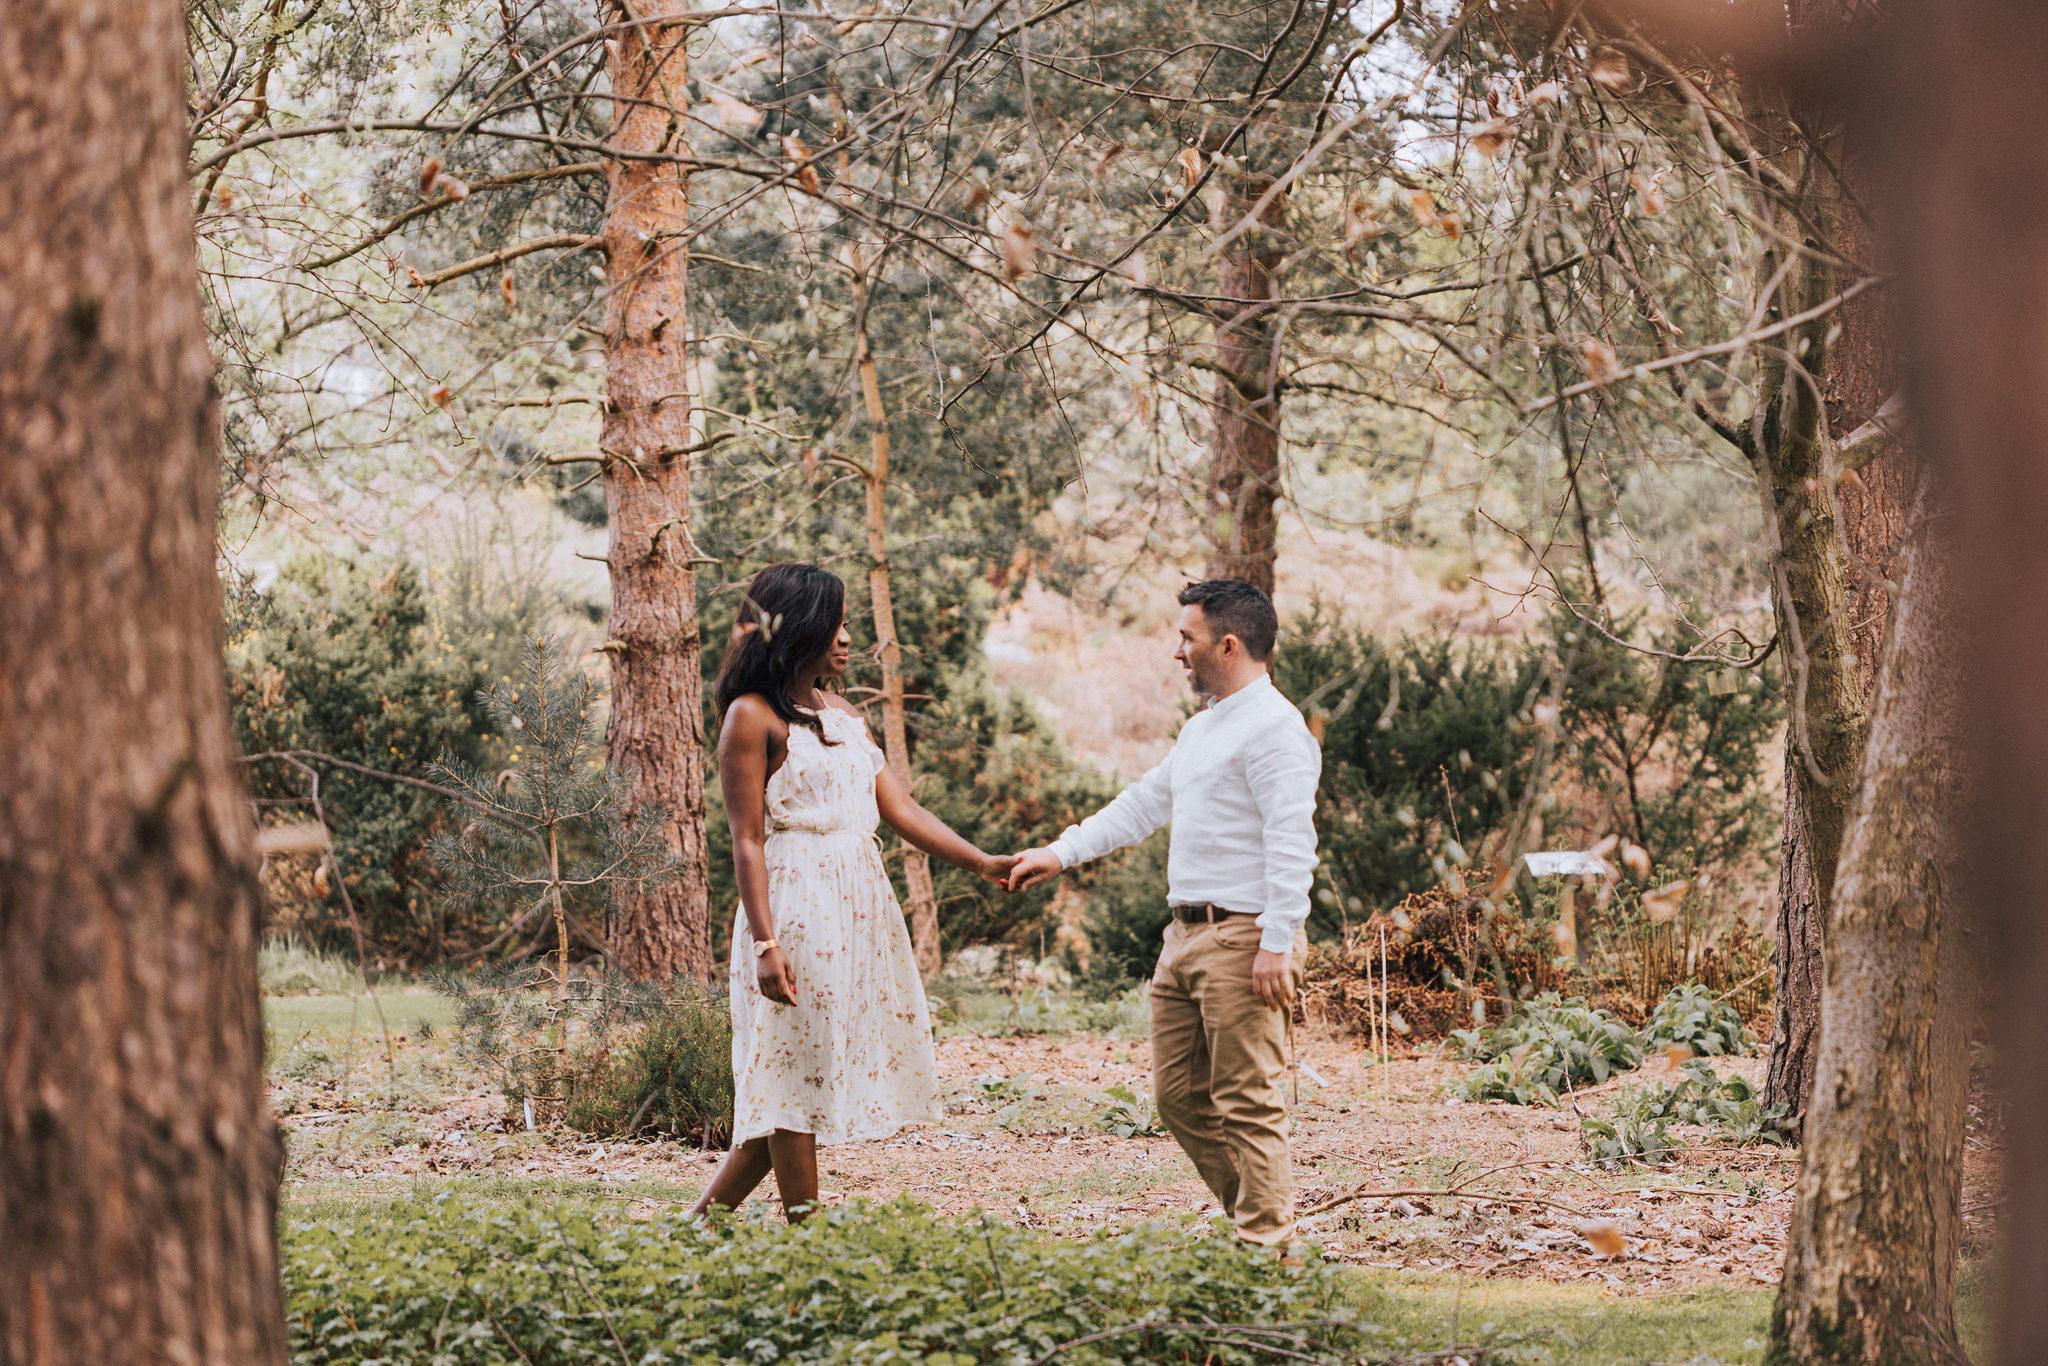 dundee-engagement-wedding-photographer-02.jpg